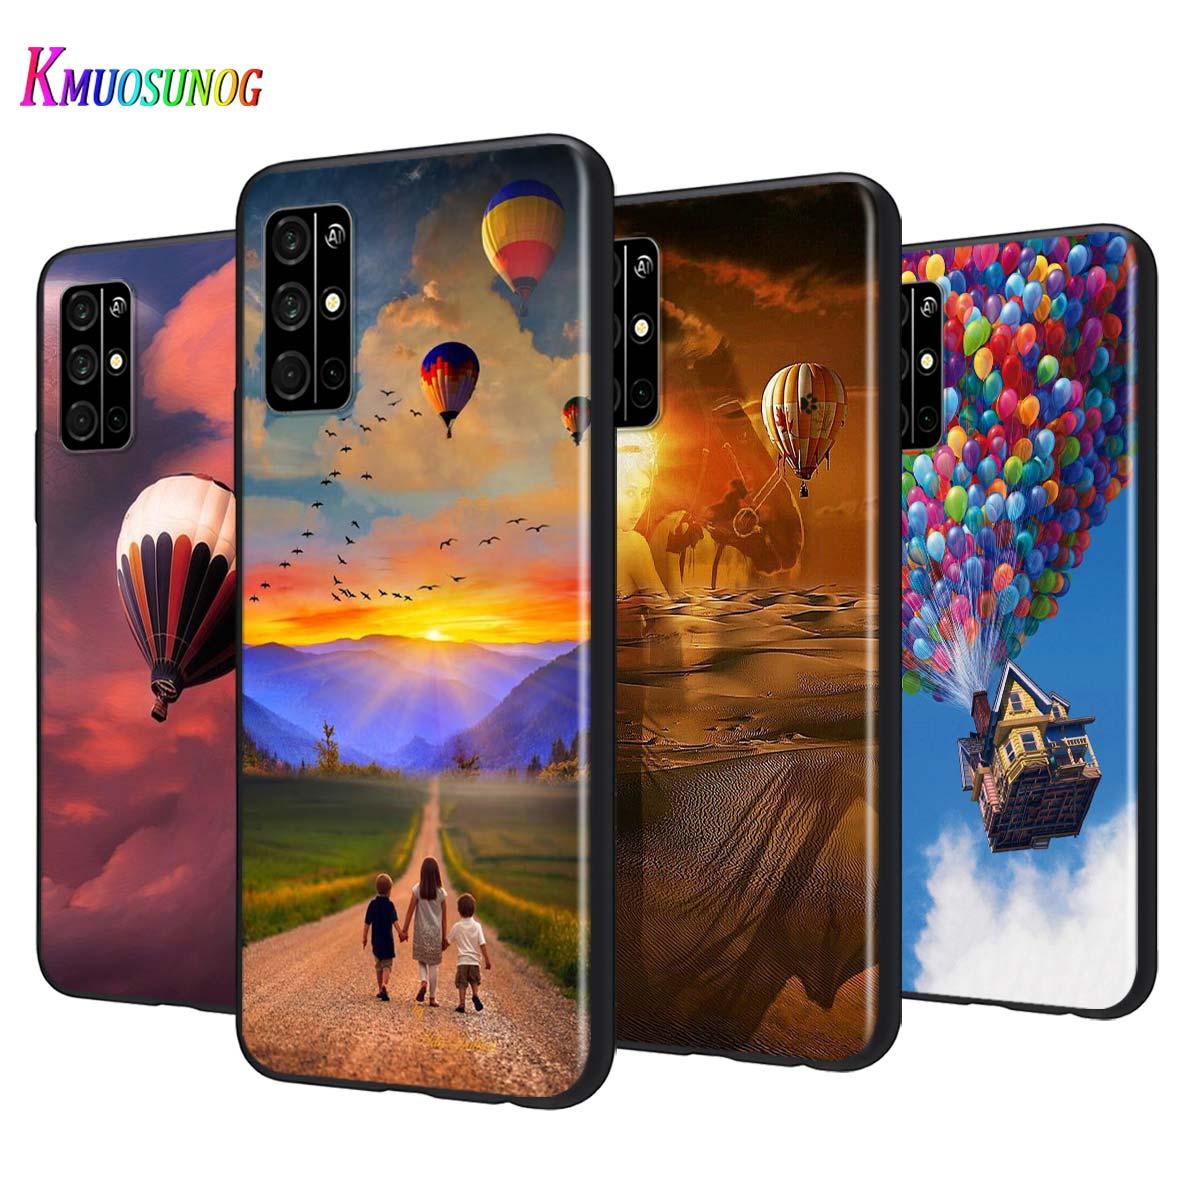 Funda negra de silicona con globo de aire caliente puesta de sol para Huawei Honor 9A 9C 9S 9X Lite 30 Pro Plus 20S 8A 8C 8S 87 7C 7S funda para teléfono